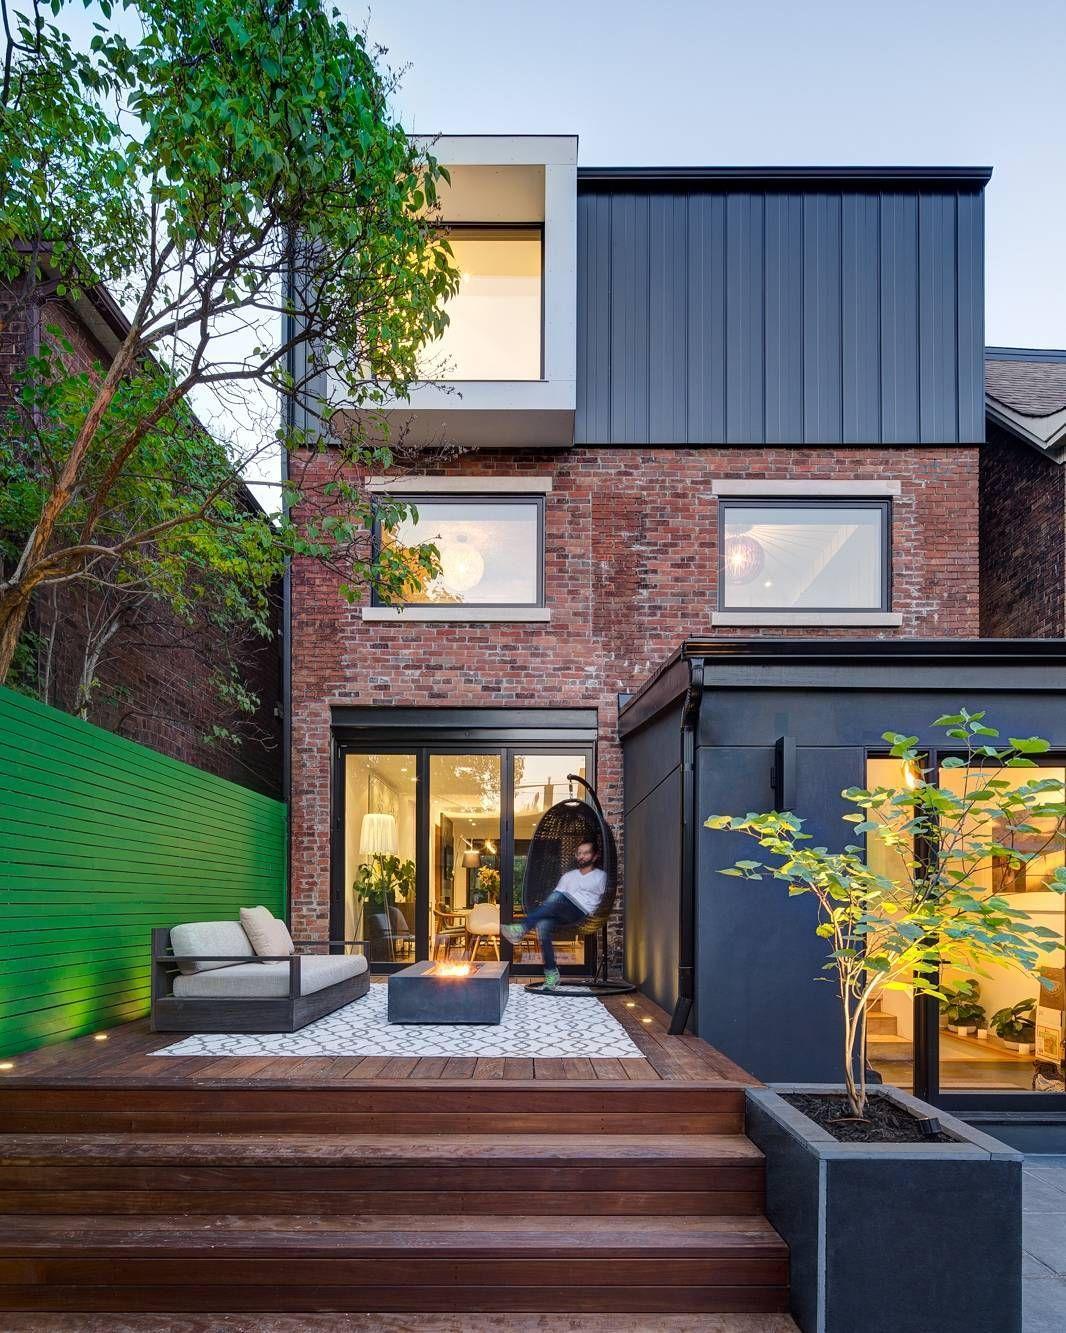 Interior Design Magazine | Housing | Pinterest | Interior design ...